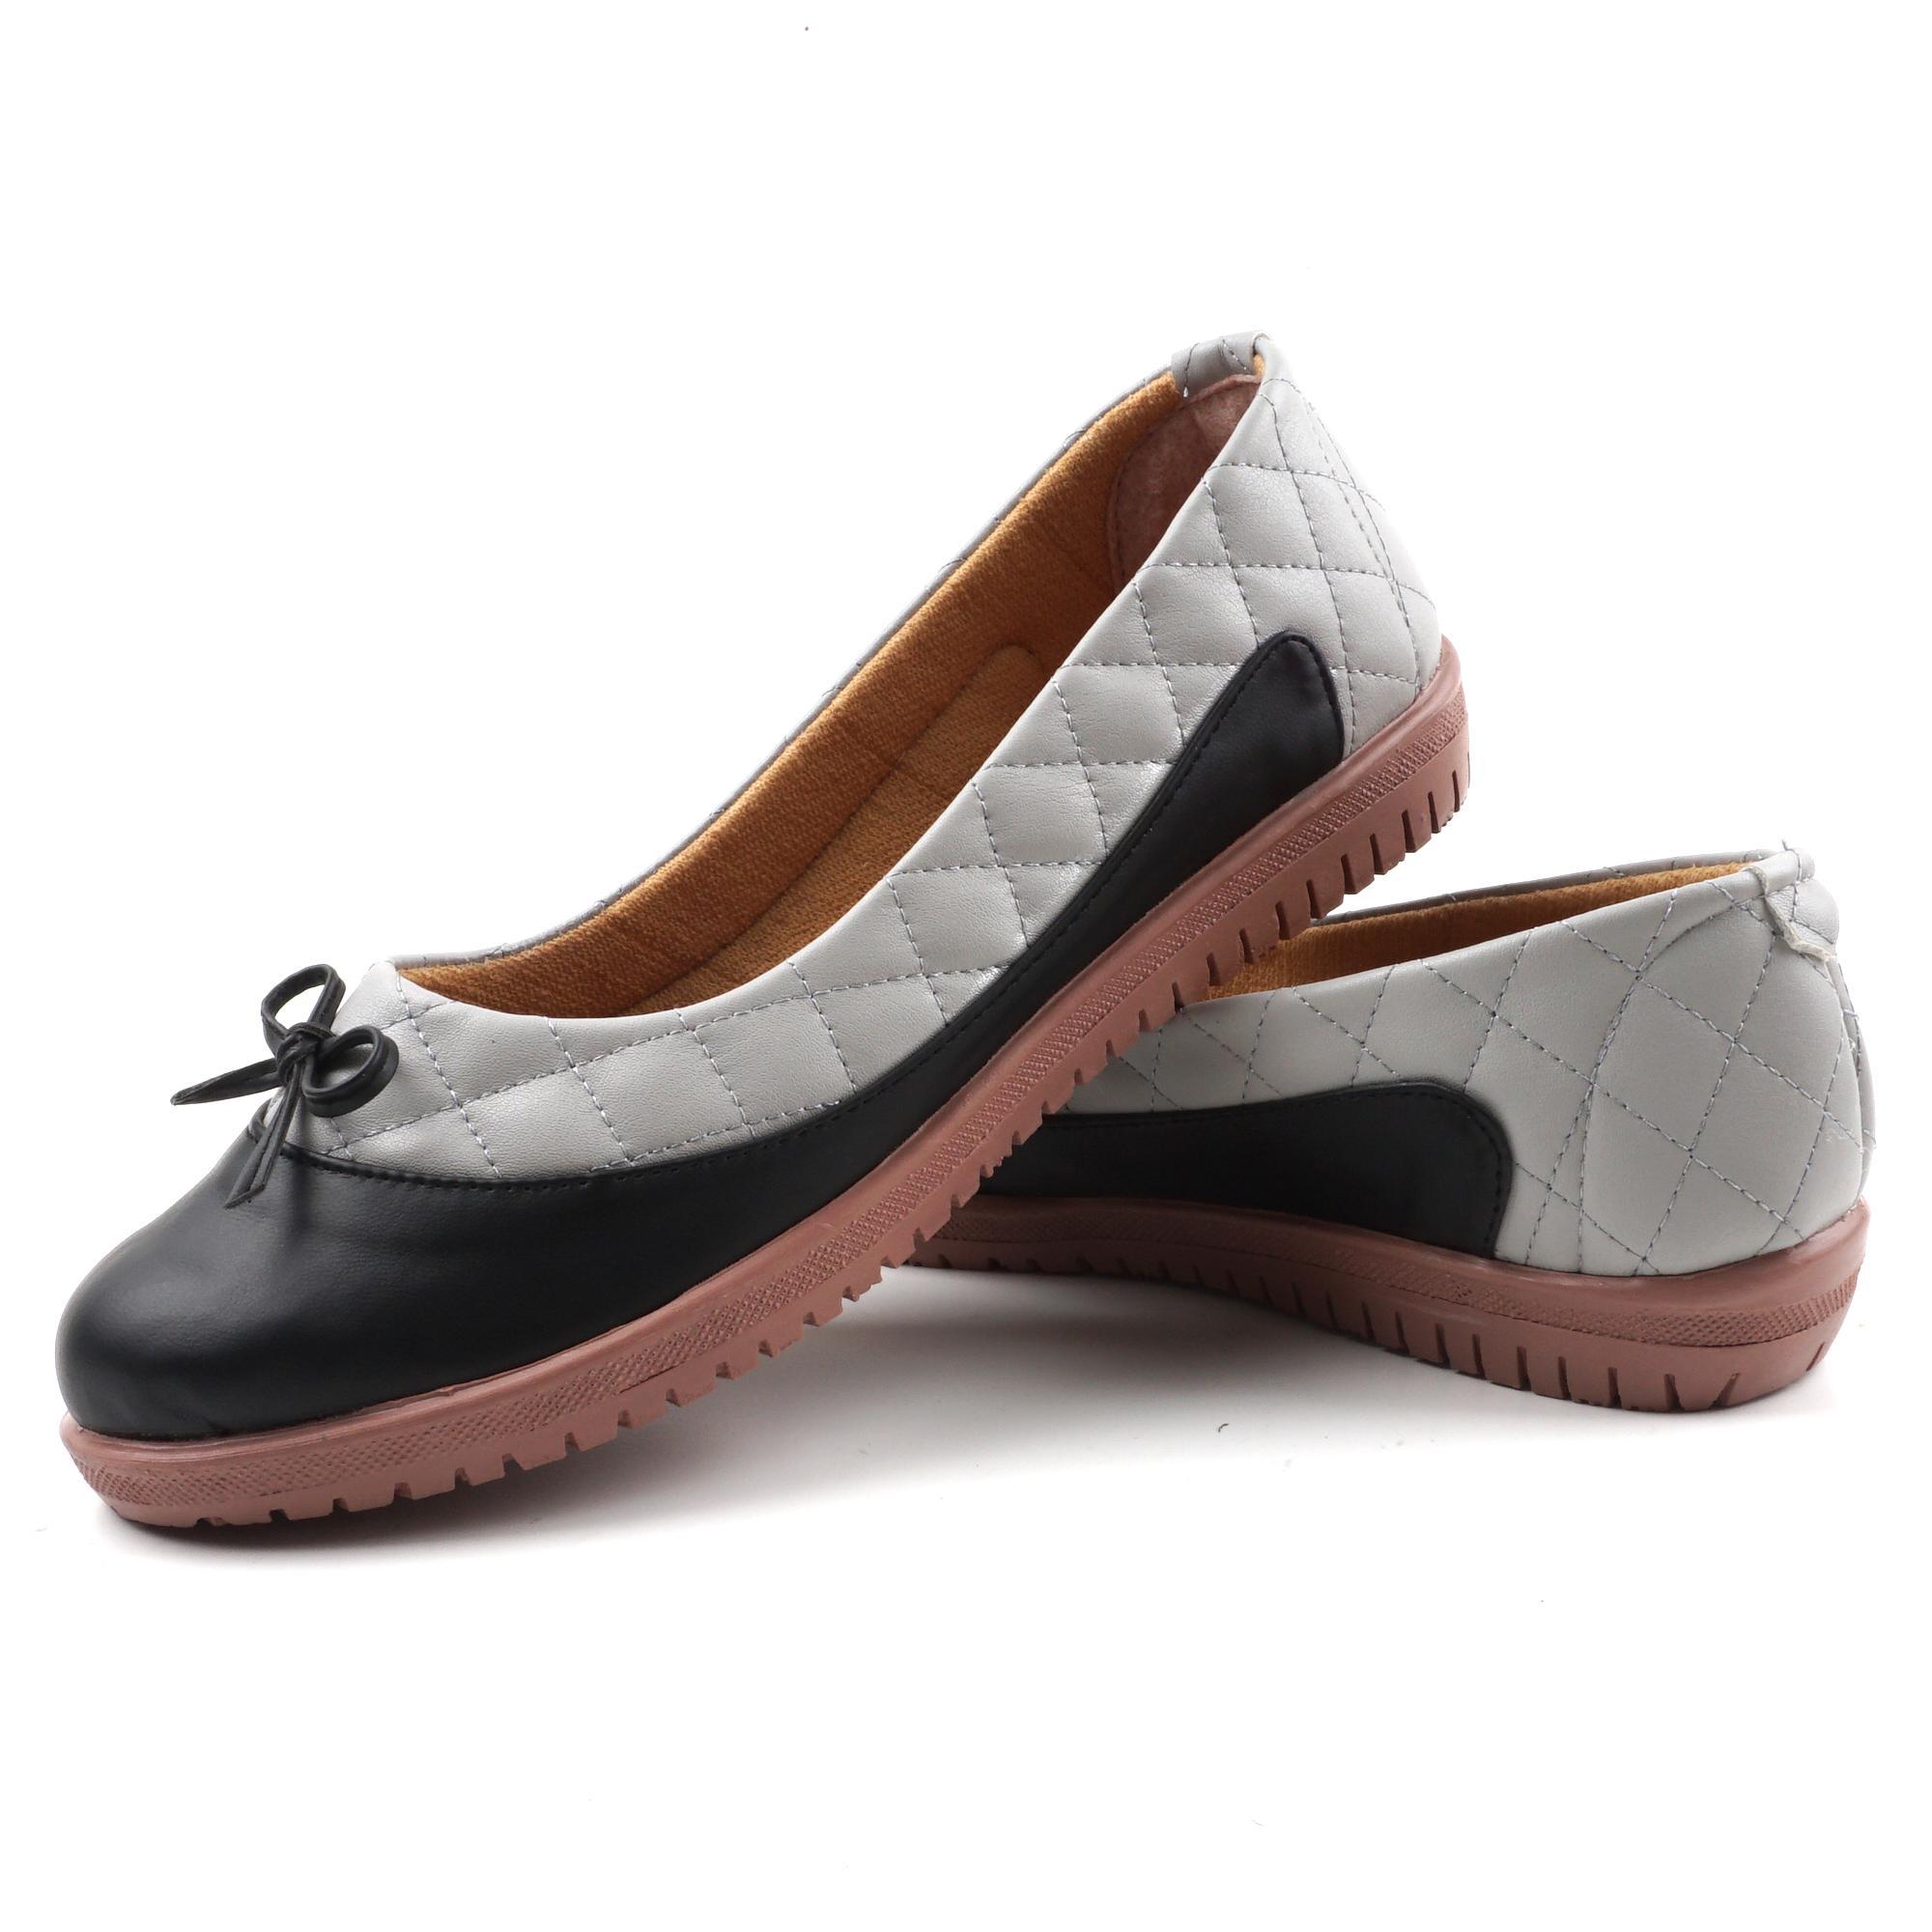 Pluvia - Sepatu Flat Shoes Slip On Wanita Quilted BL08 - Coklat Moka   Hitam efd605885d